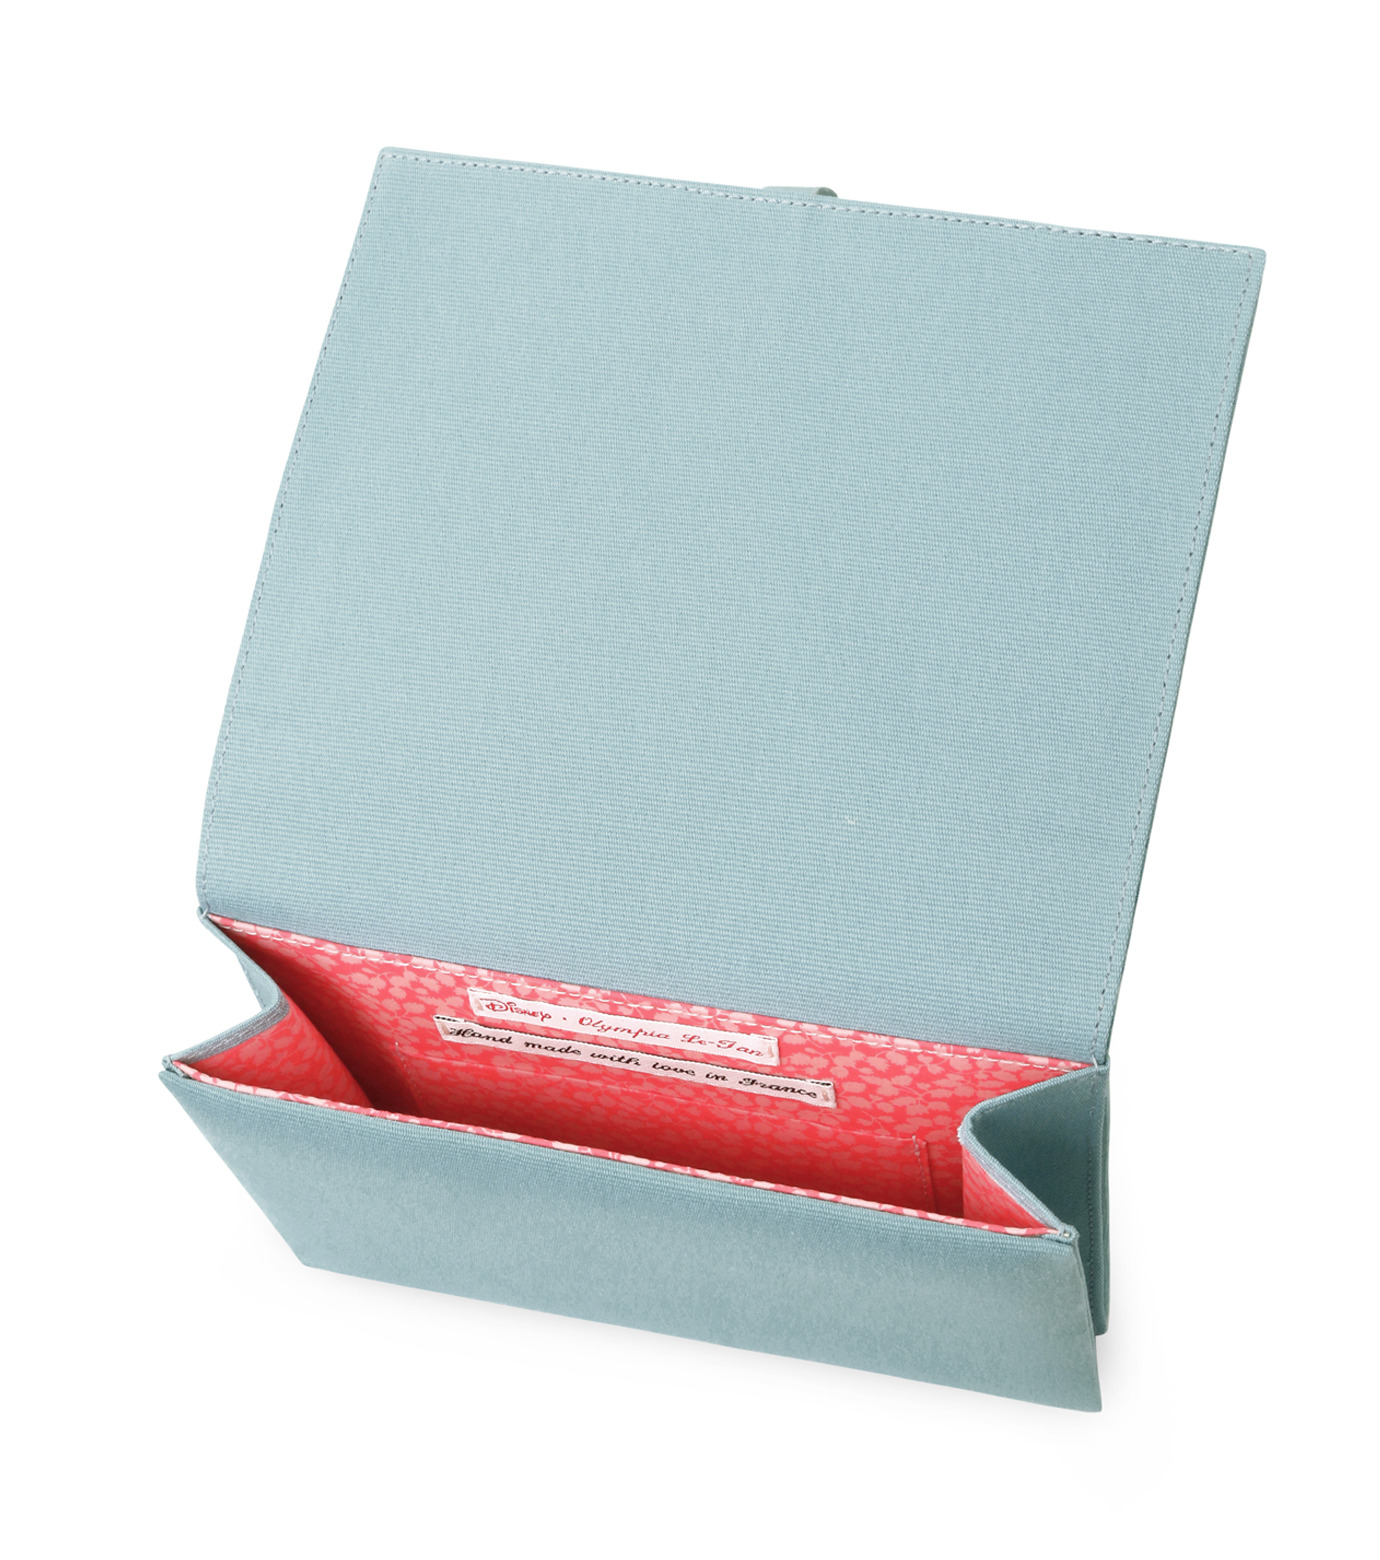 Olympia Le-Tan(オリンピア ルタン)のNotebook Clutch Alice-LIGHT BLUE(クラッチバッグ/clutch bag)-RE16BN001-91 拡大詳細画像4